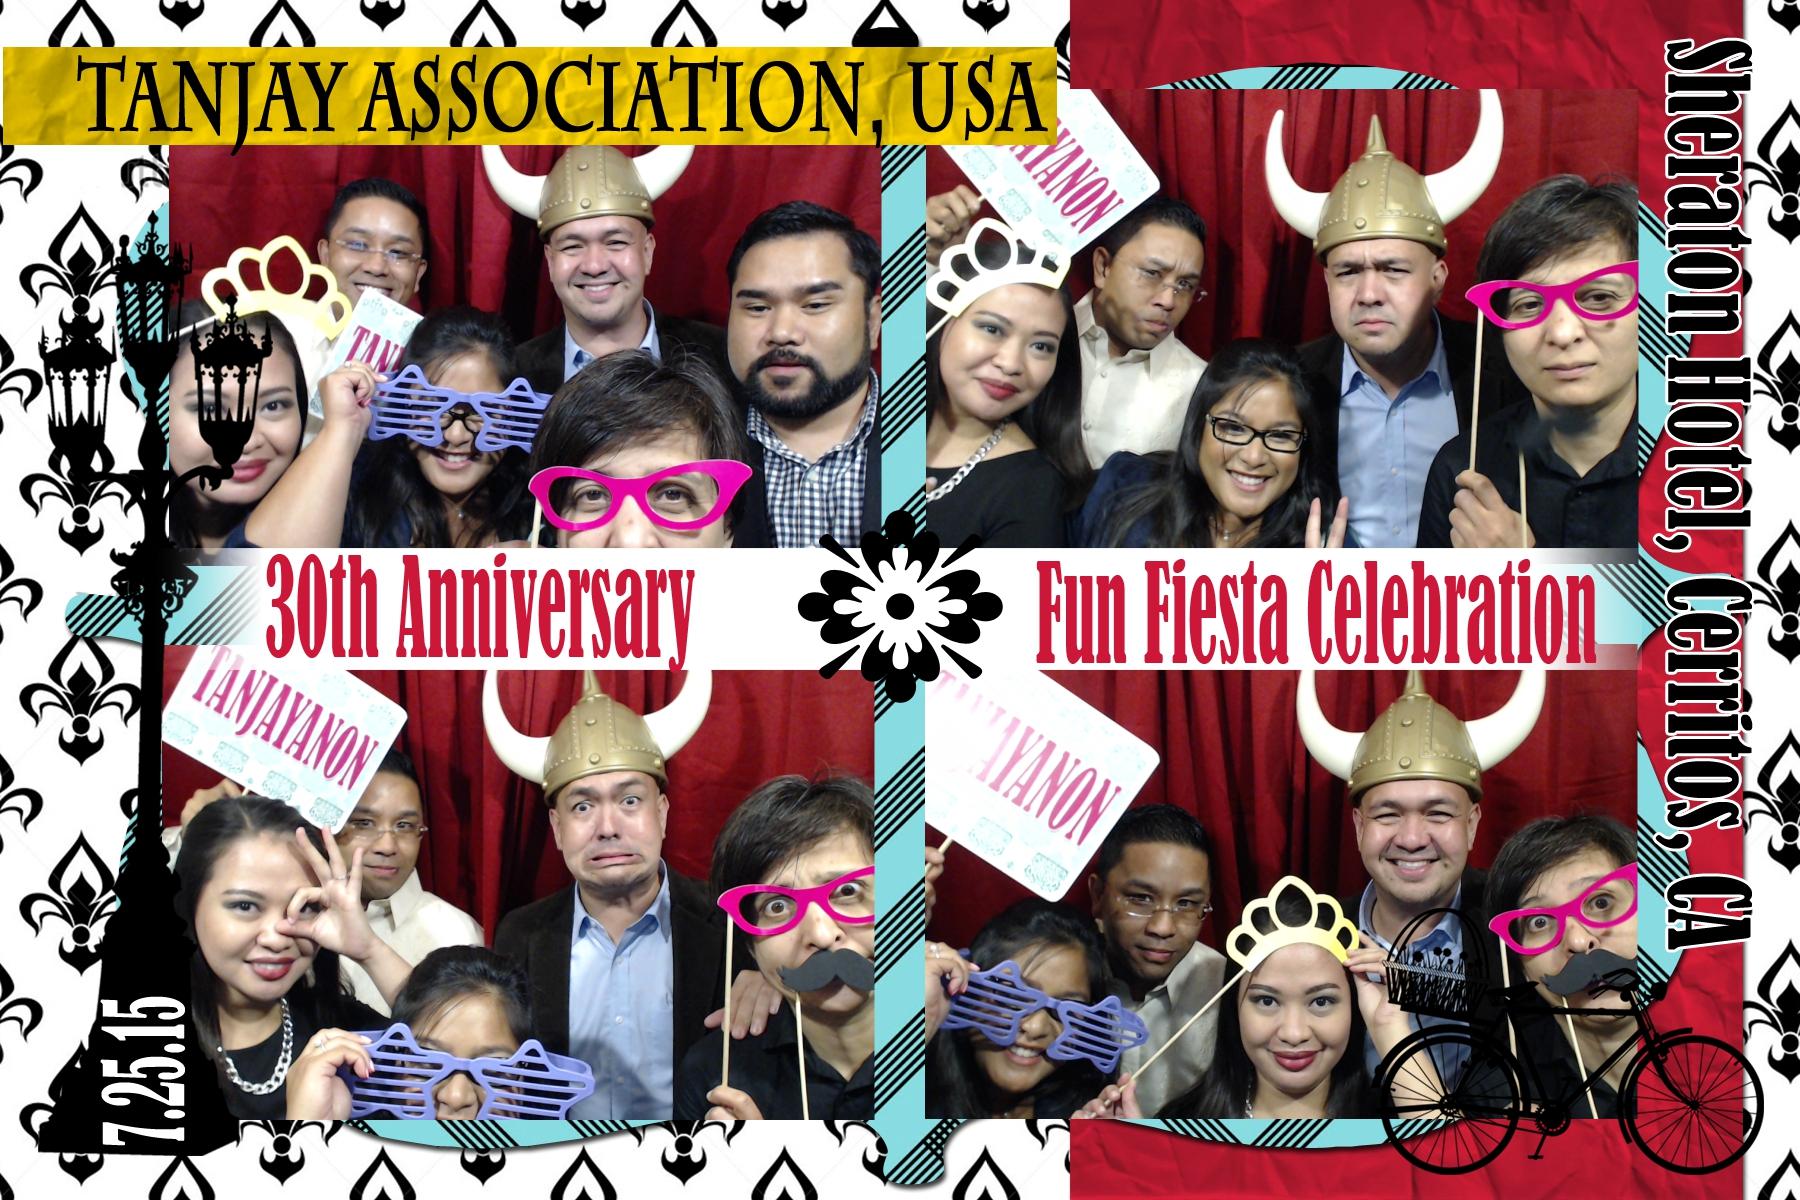 Tanjay Association 30th Anniversary